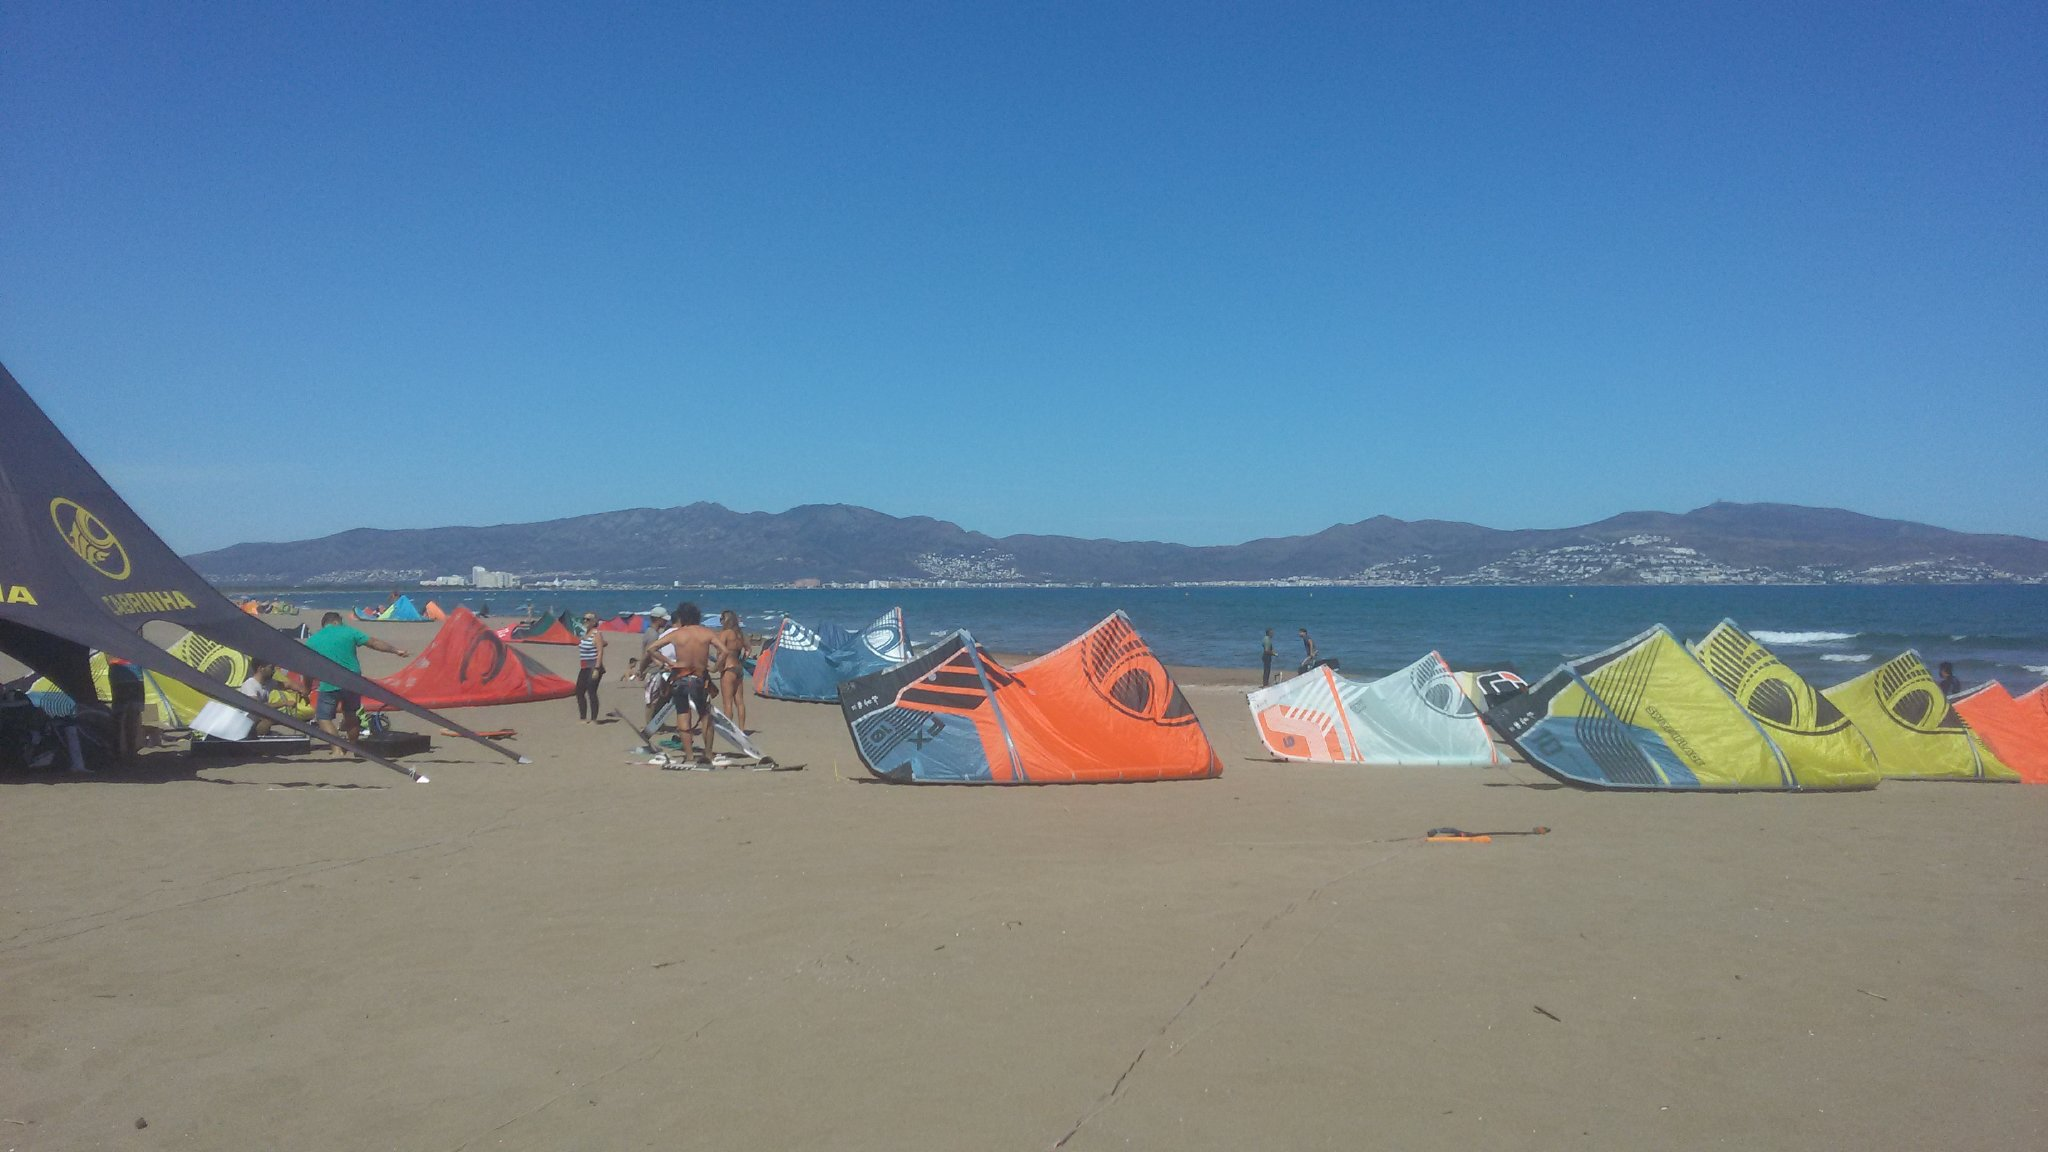 Kiten am Strand